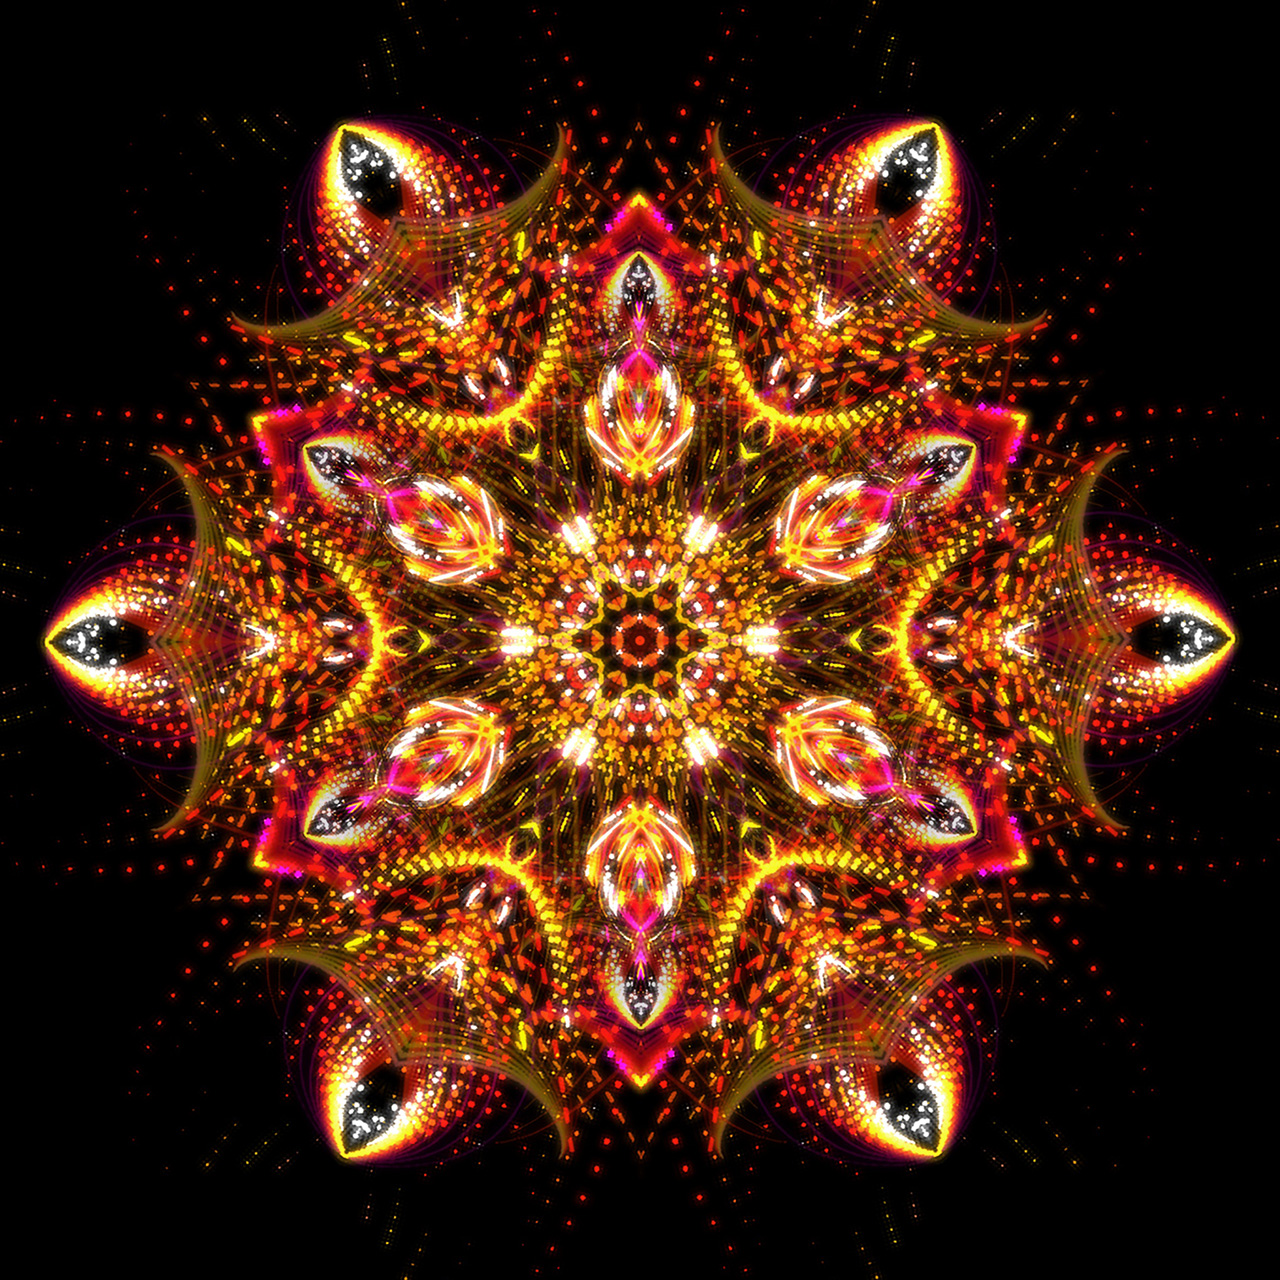 Inspirit, Graphic Design Software Screenshot